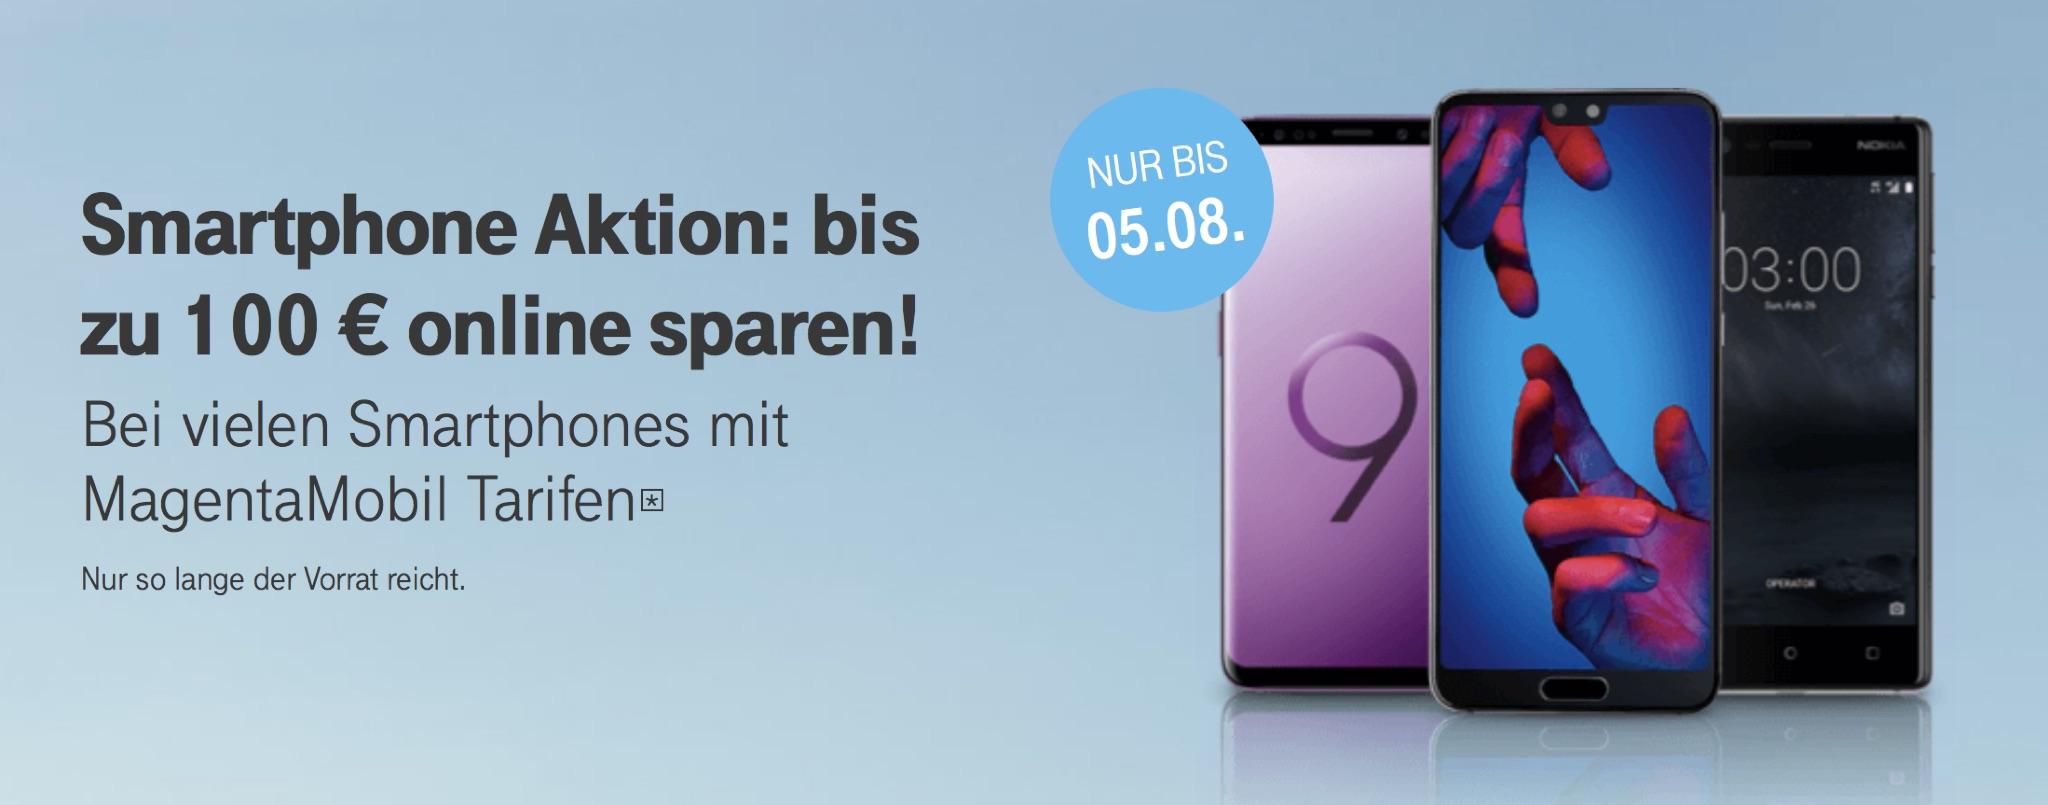 Telekom Aktion 100 Euro Rabatt Auf Iphone X Iphone 8 Samsung